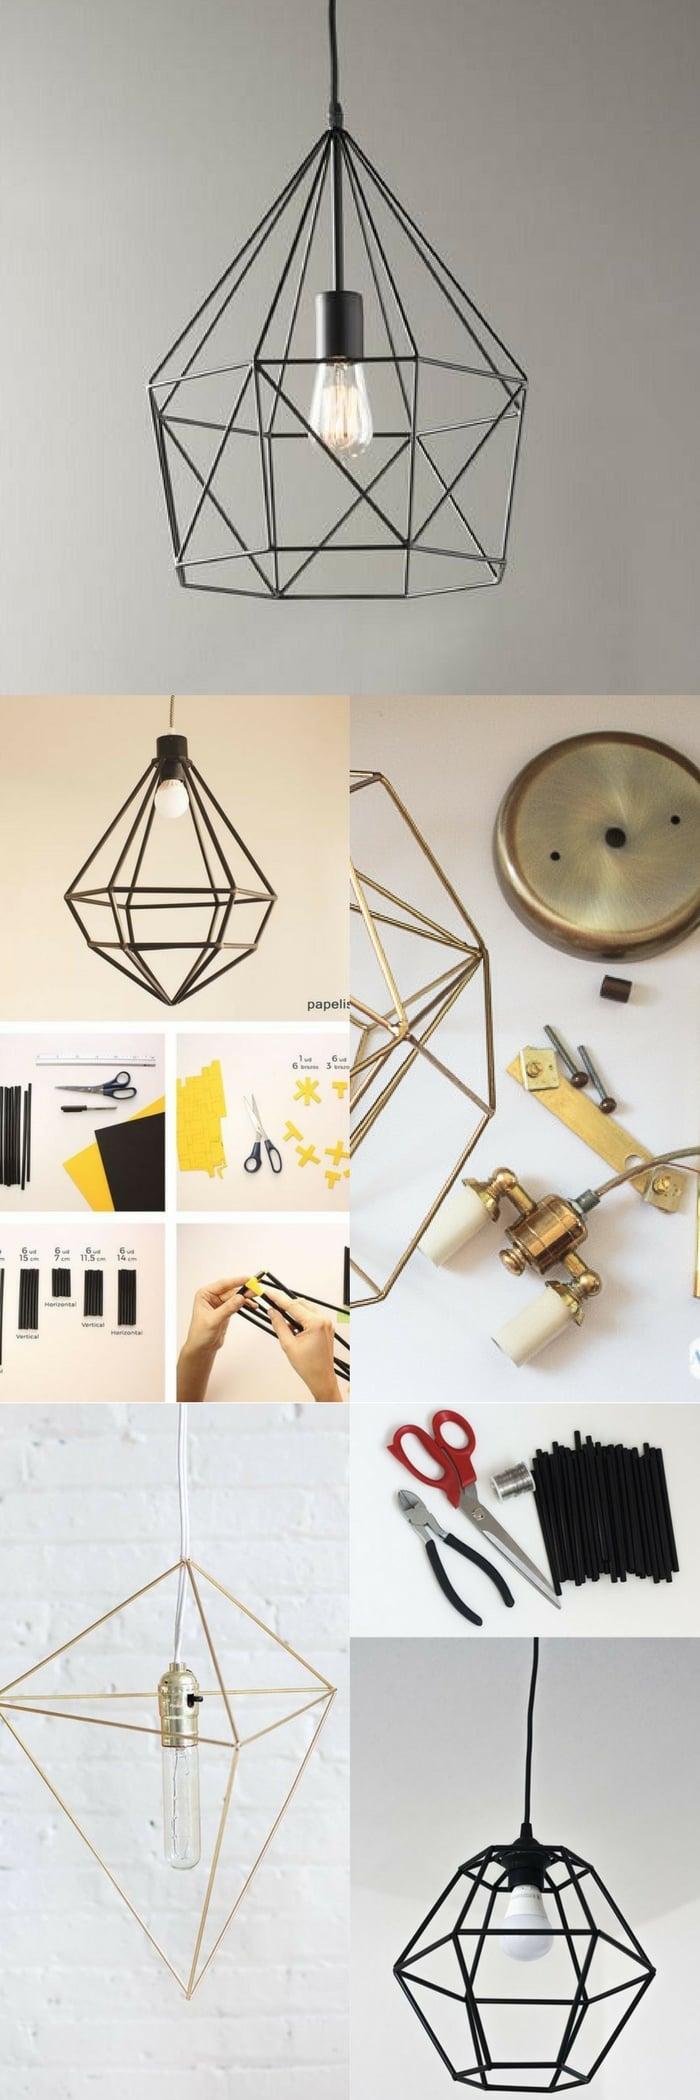 25 diy lamp shade projects ideas sky rye design geometric lamp diy aloadofball Image collections